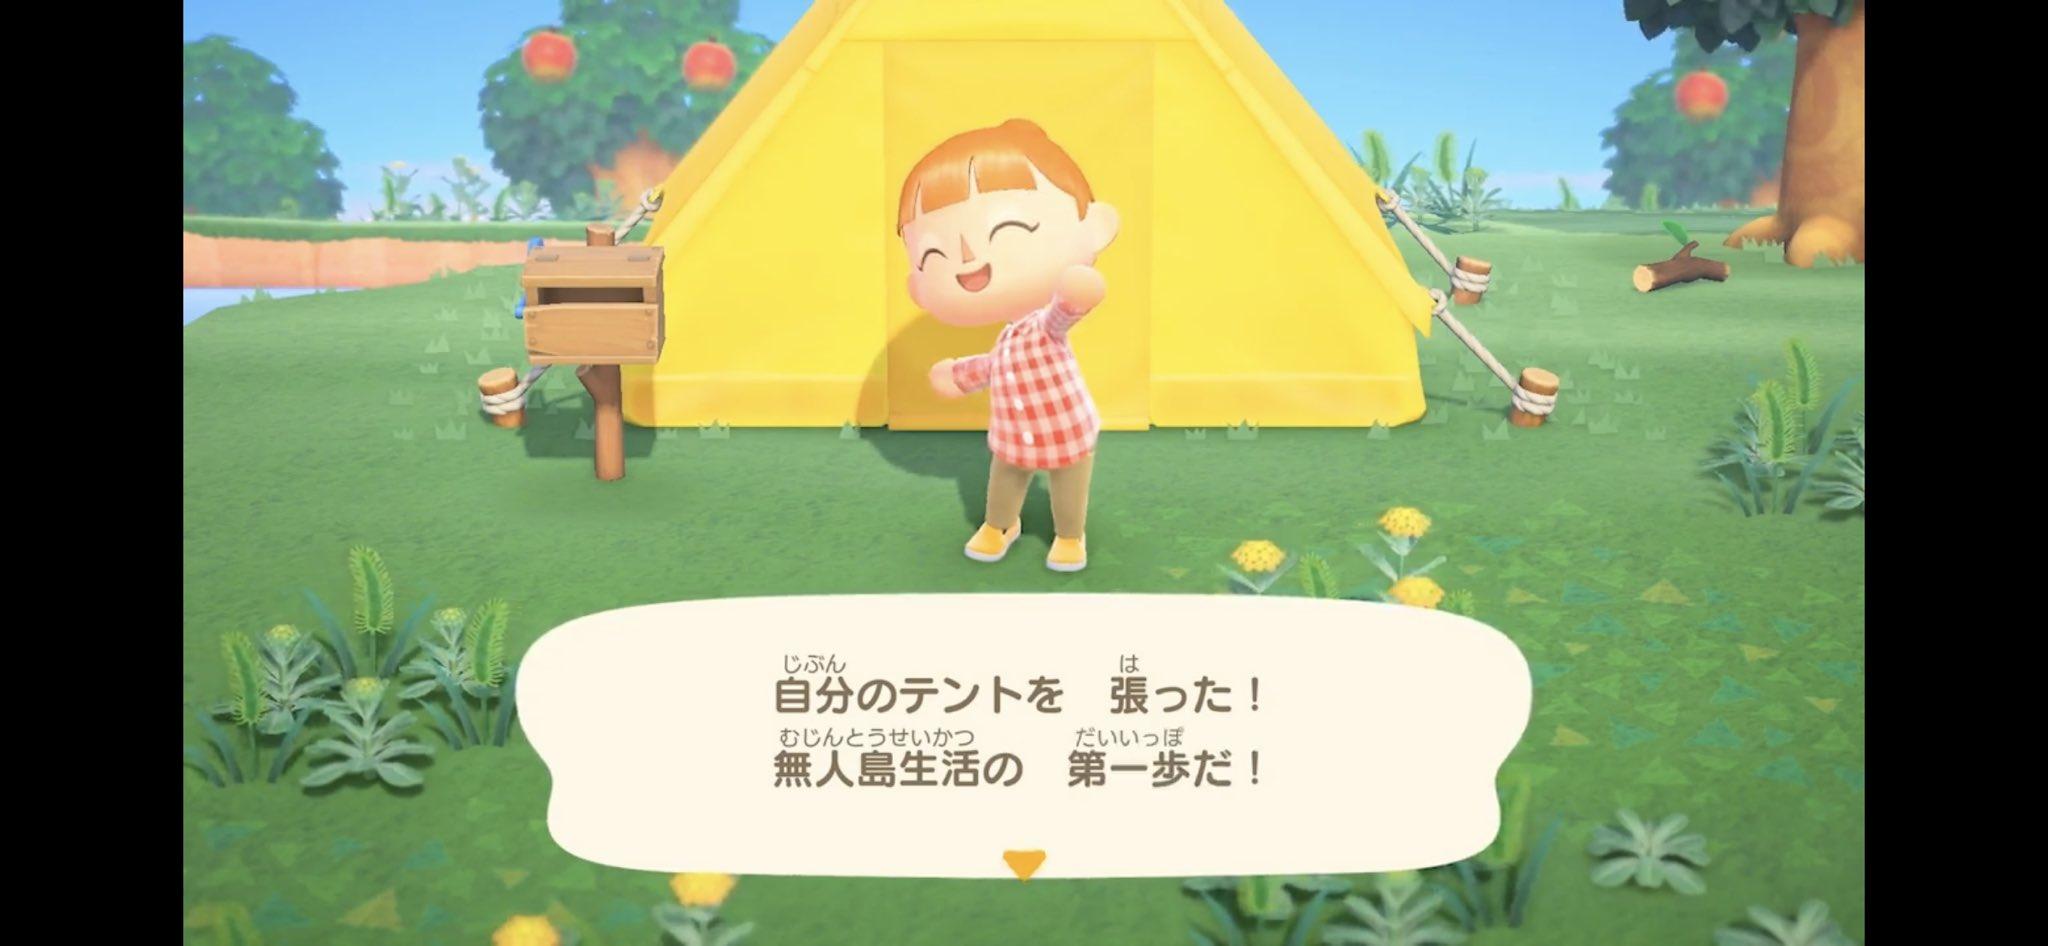 【#NintendoDirectJP】最新作『あつまれ どうぶつの森』2020年3月20日に発売決定!